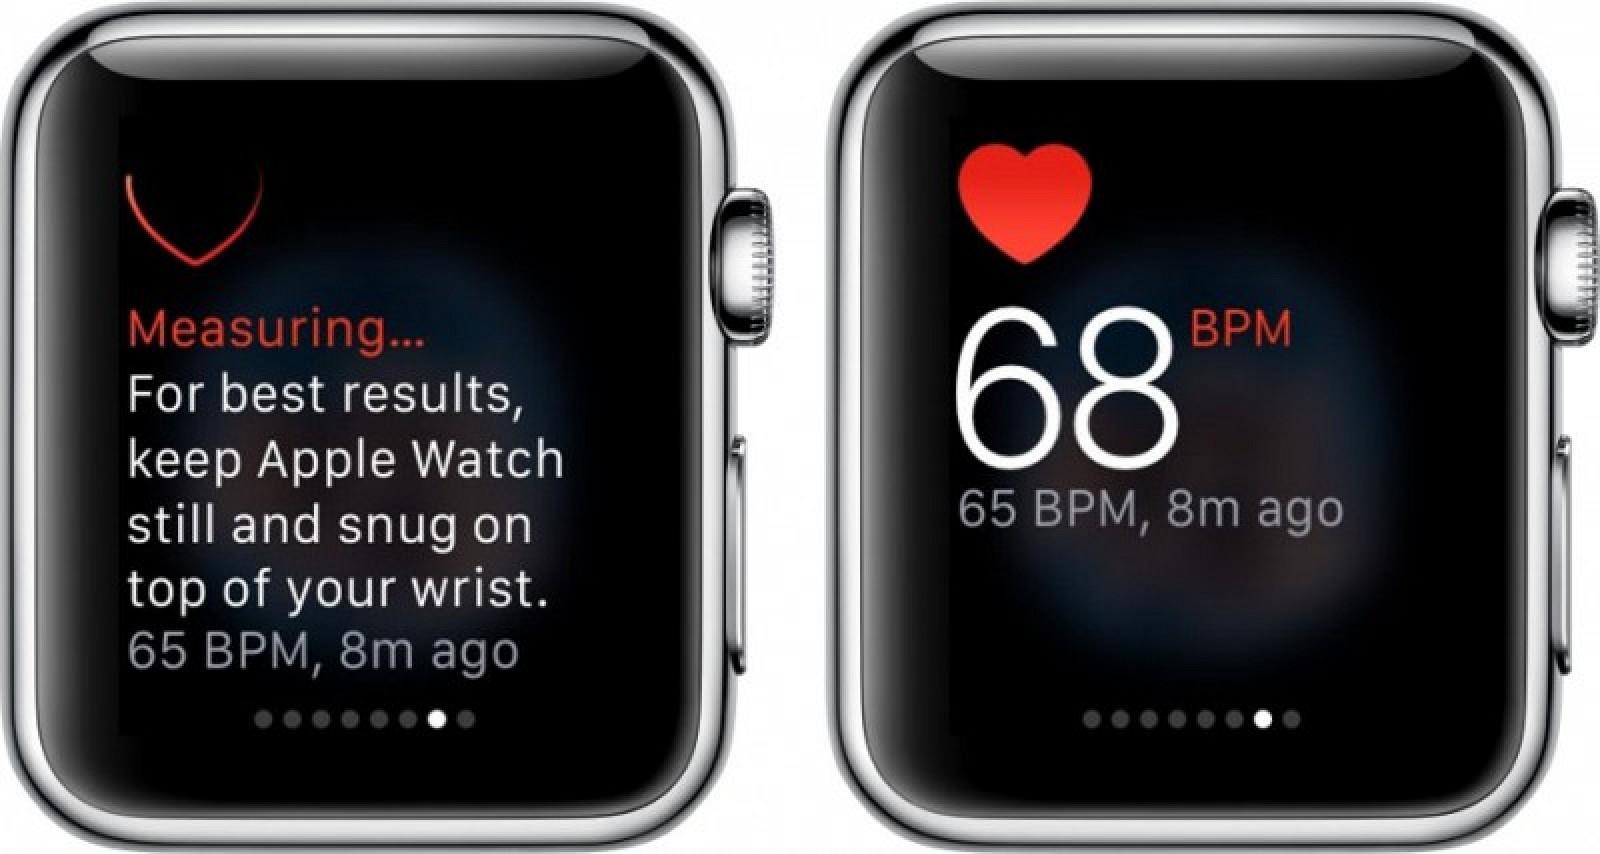 Apple Watch precisione cardiofrequenzimetro